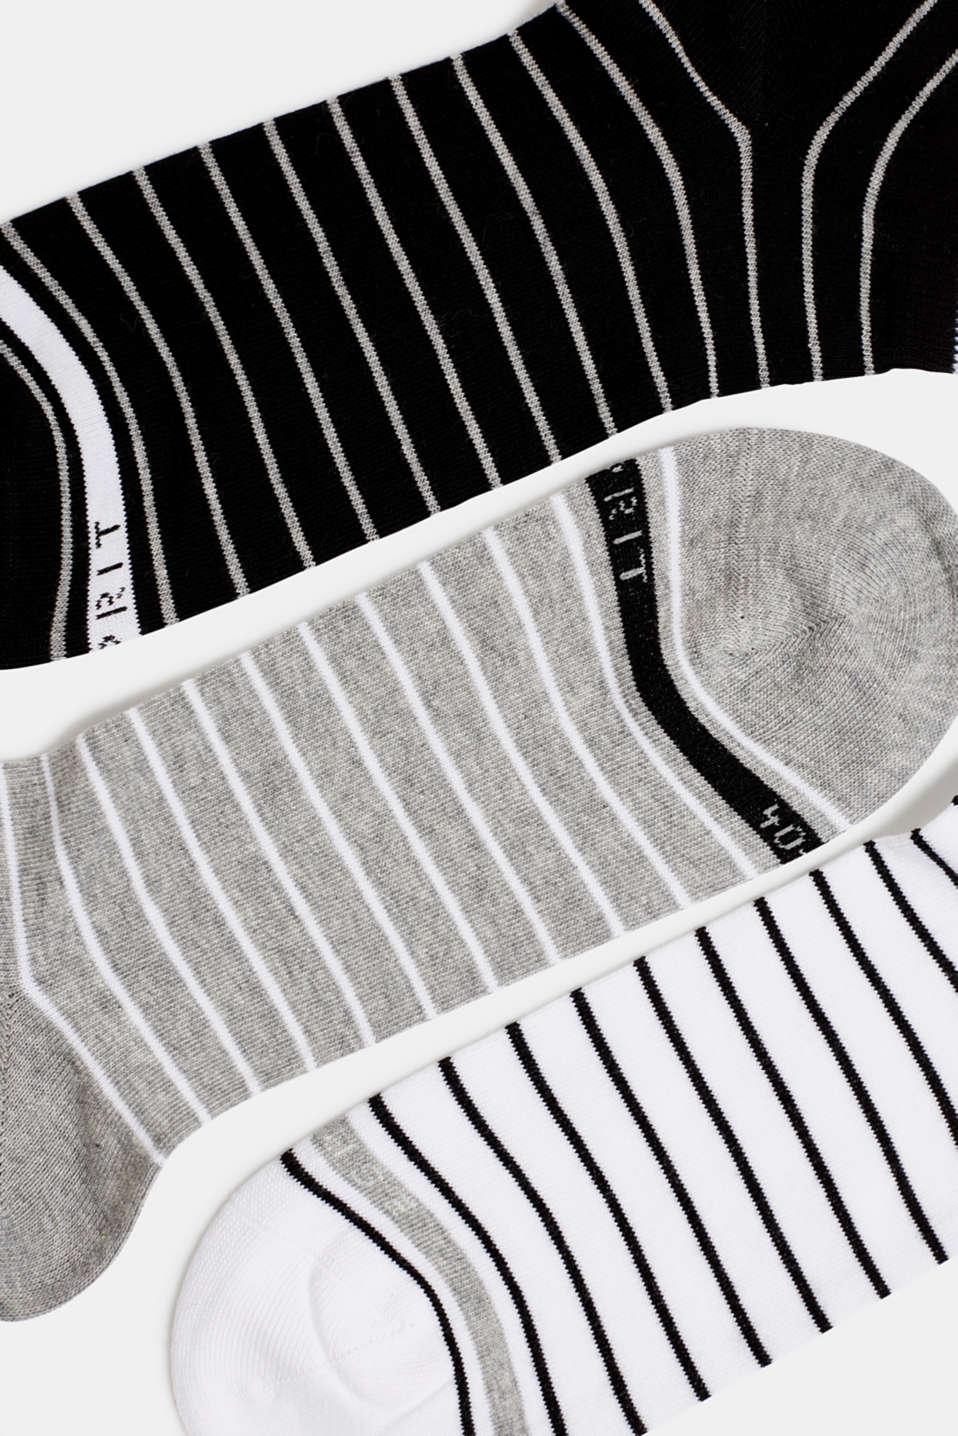 Triple pack: striped trainer socks, SORTIMENT, detail image number 1